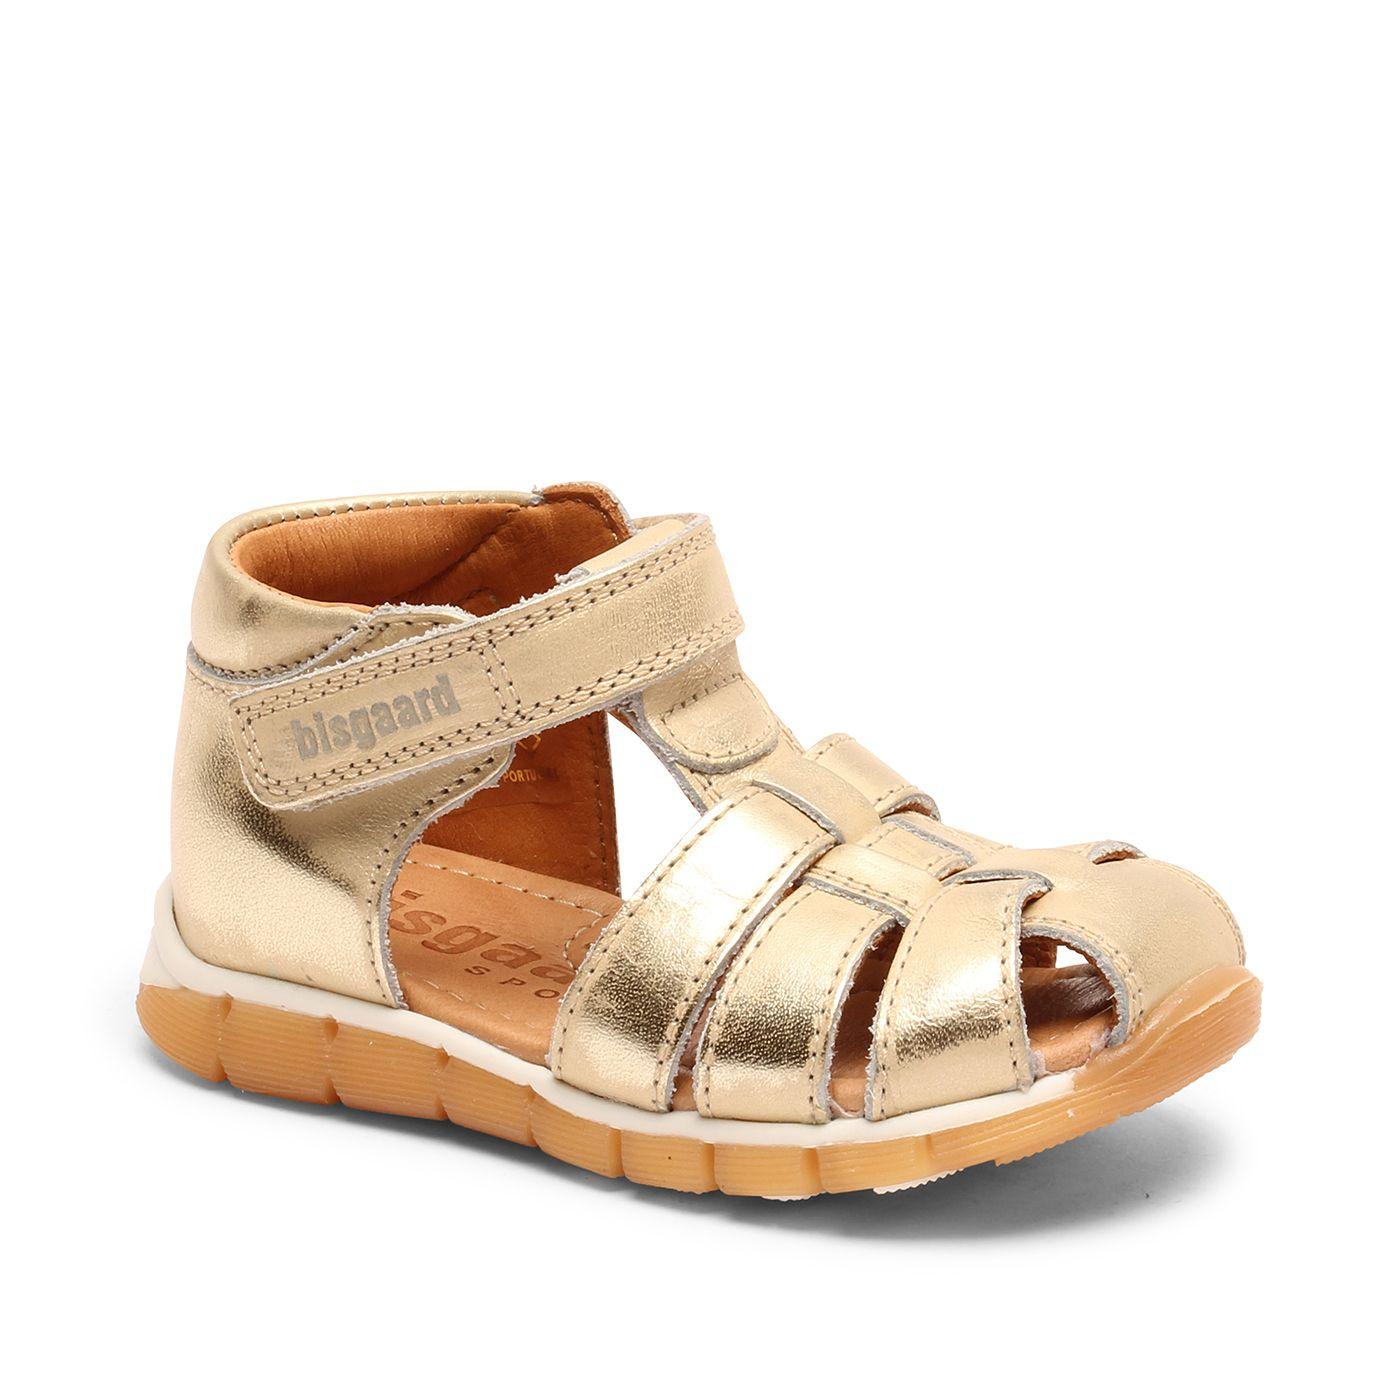 Bisgaard Billie sandal